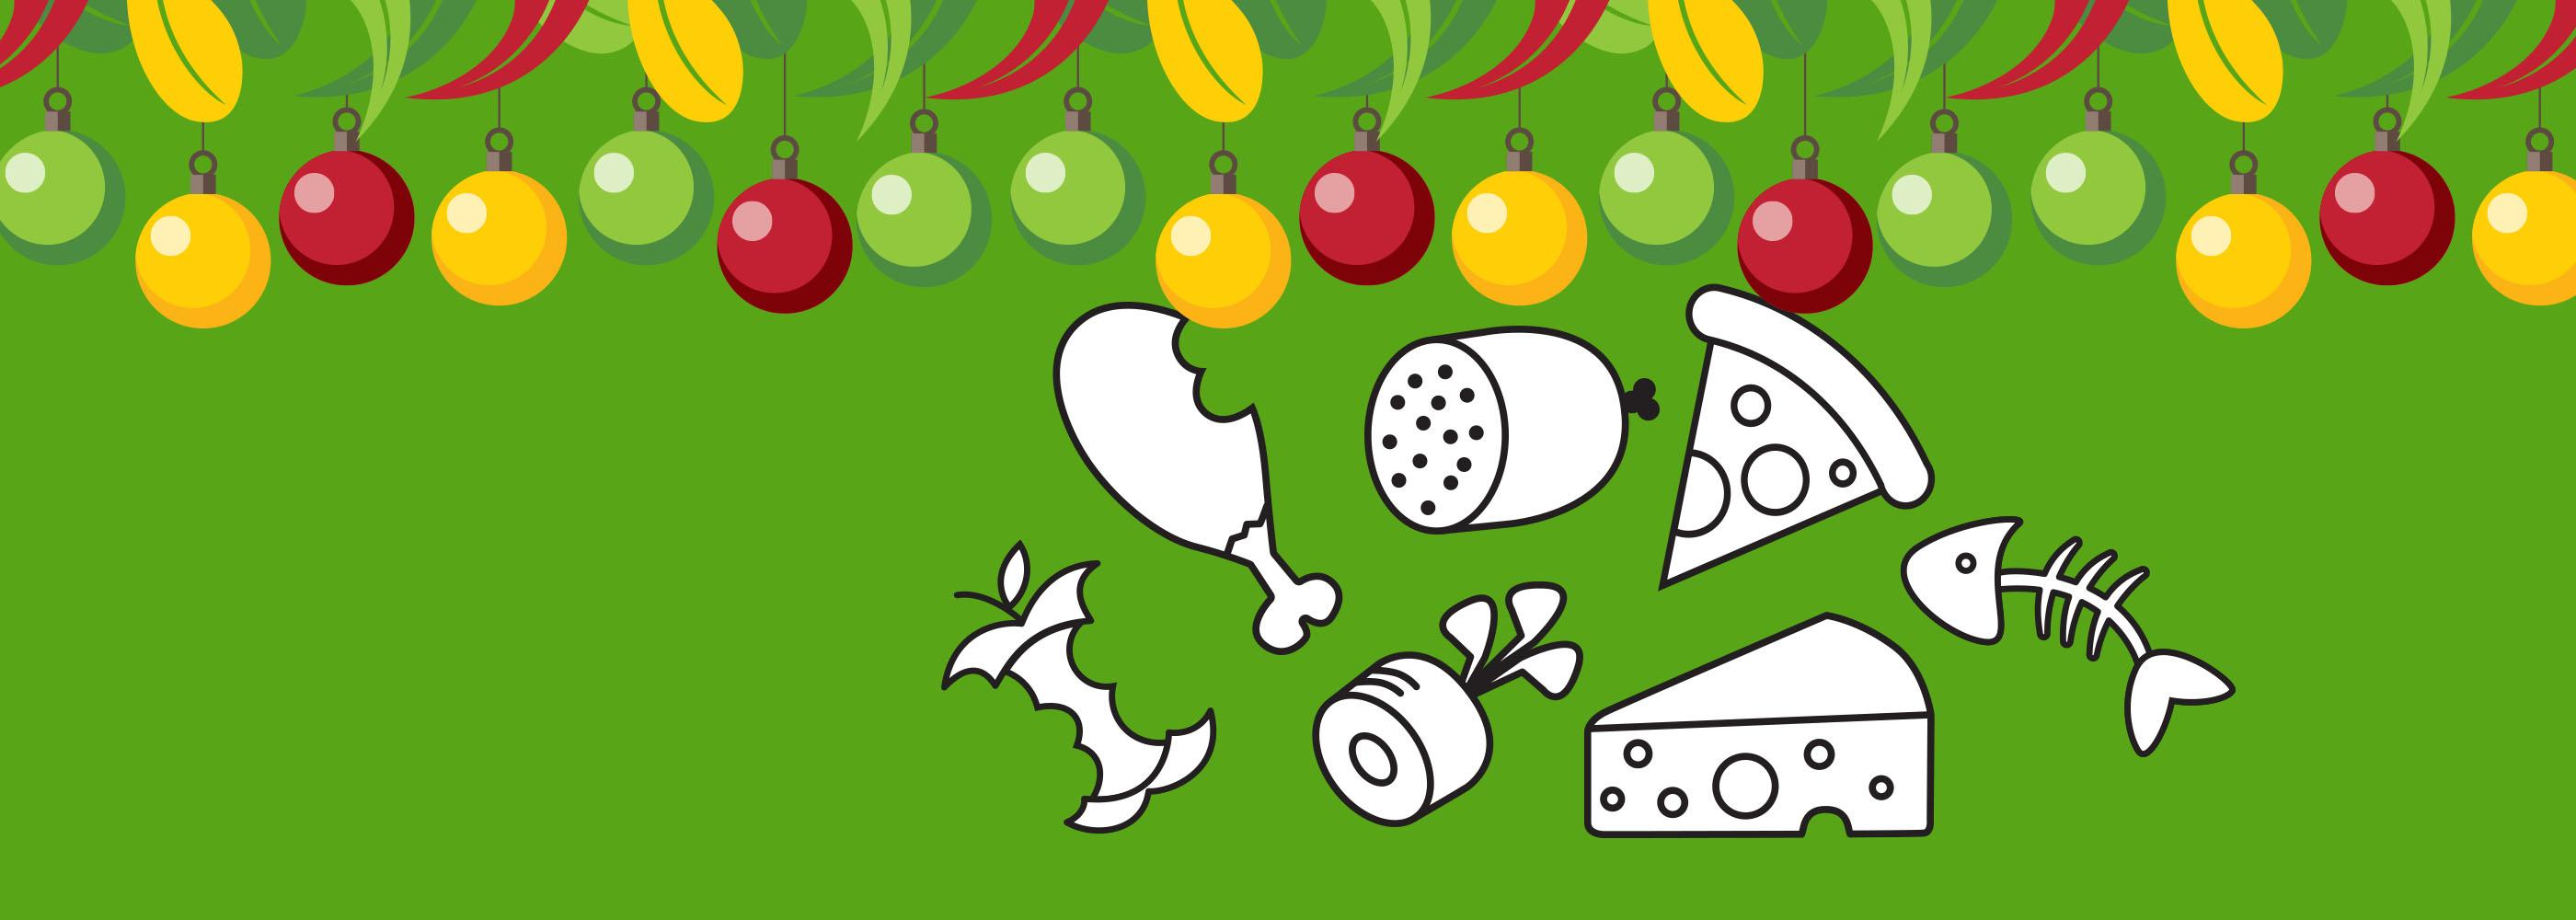 NAWMA Festive Season Tips - Food Scraps